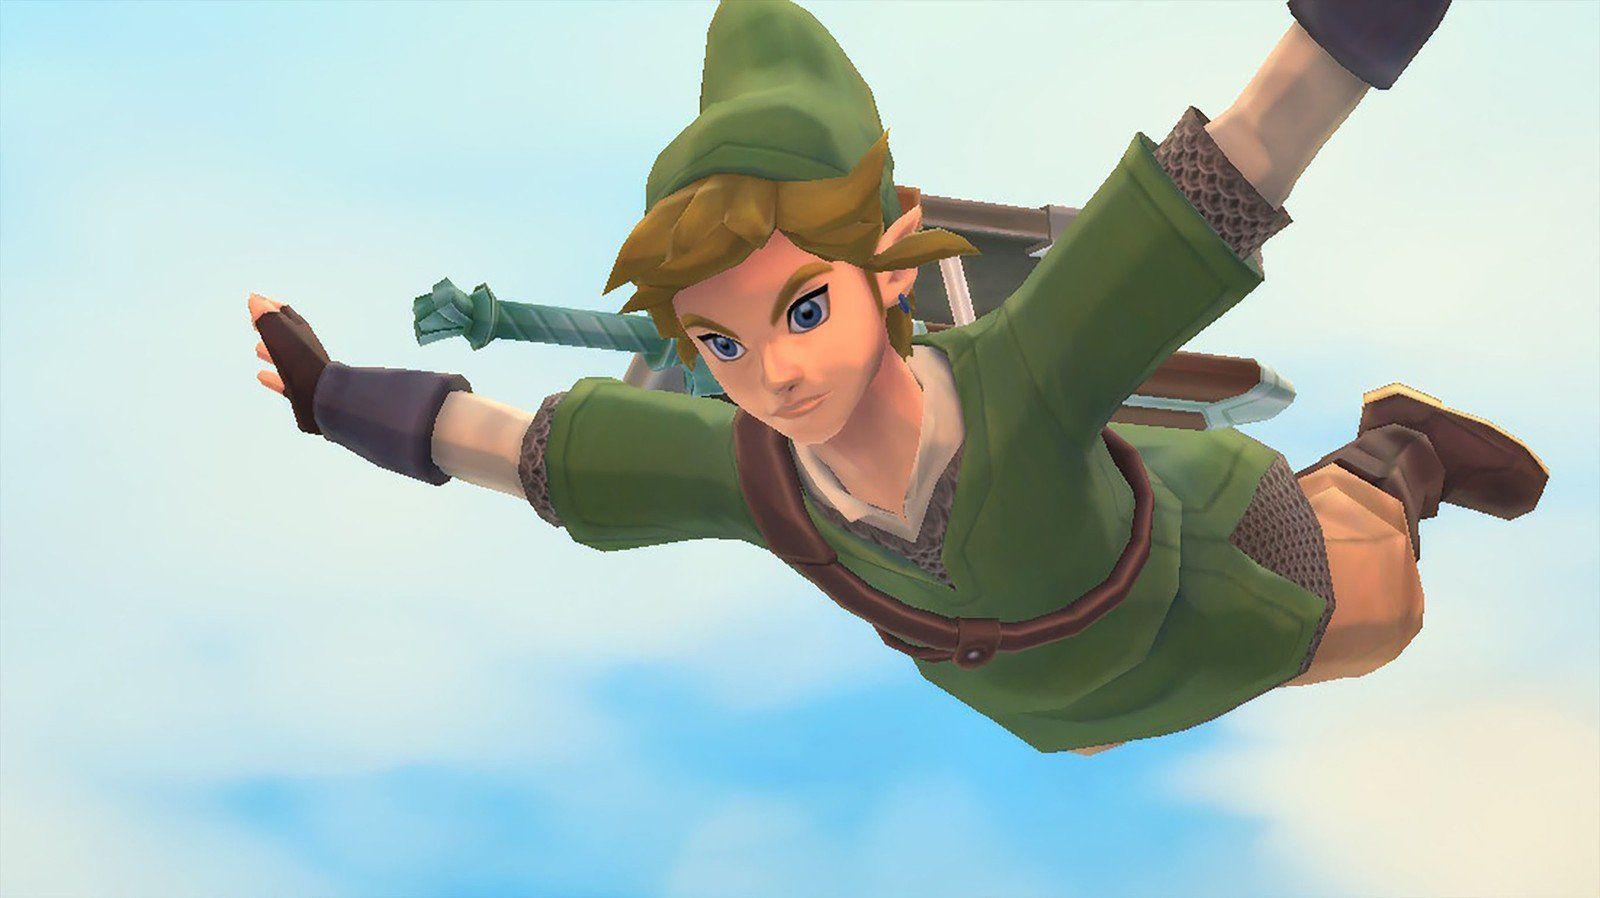 legend of zelda, link, nintendo switch, wii, skyward sword hd,